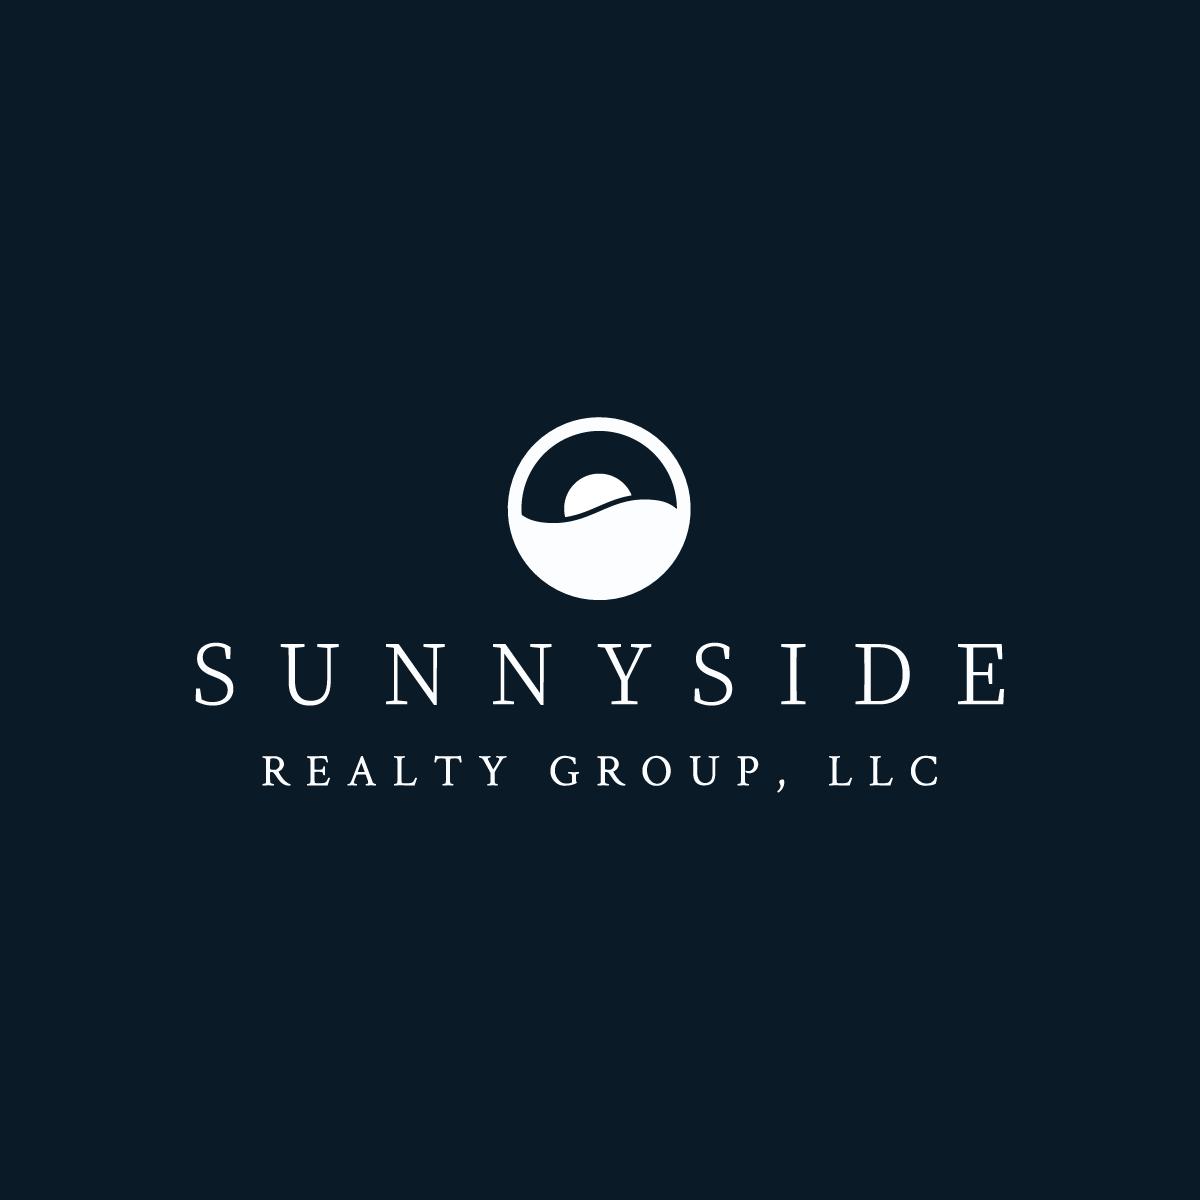 Sunnyside Realty Group logo in black and white.